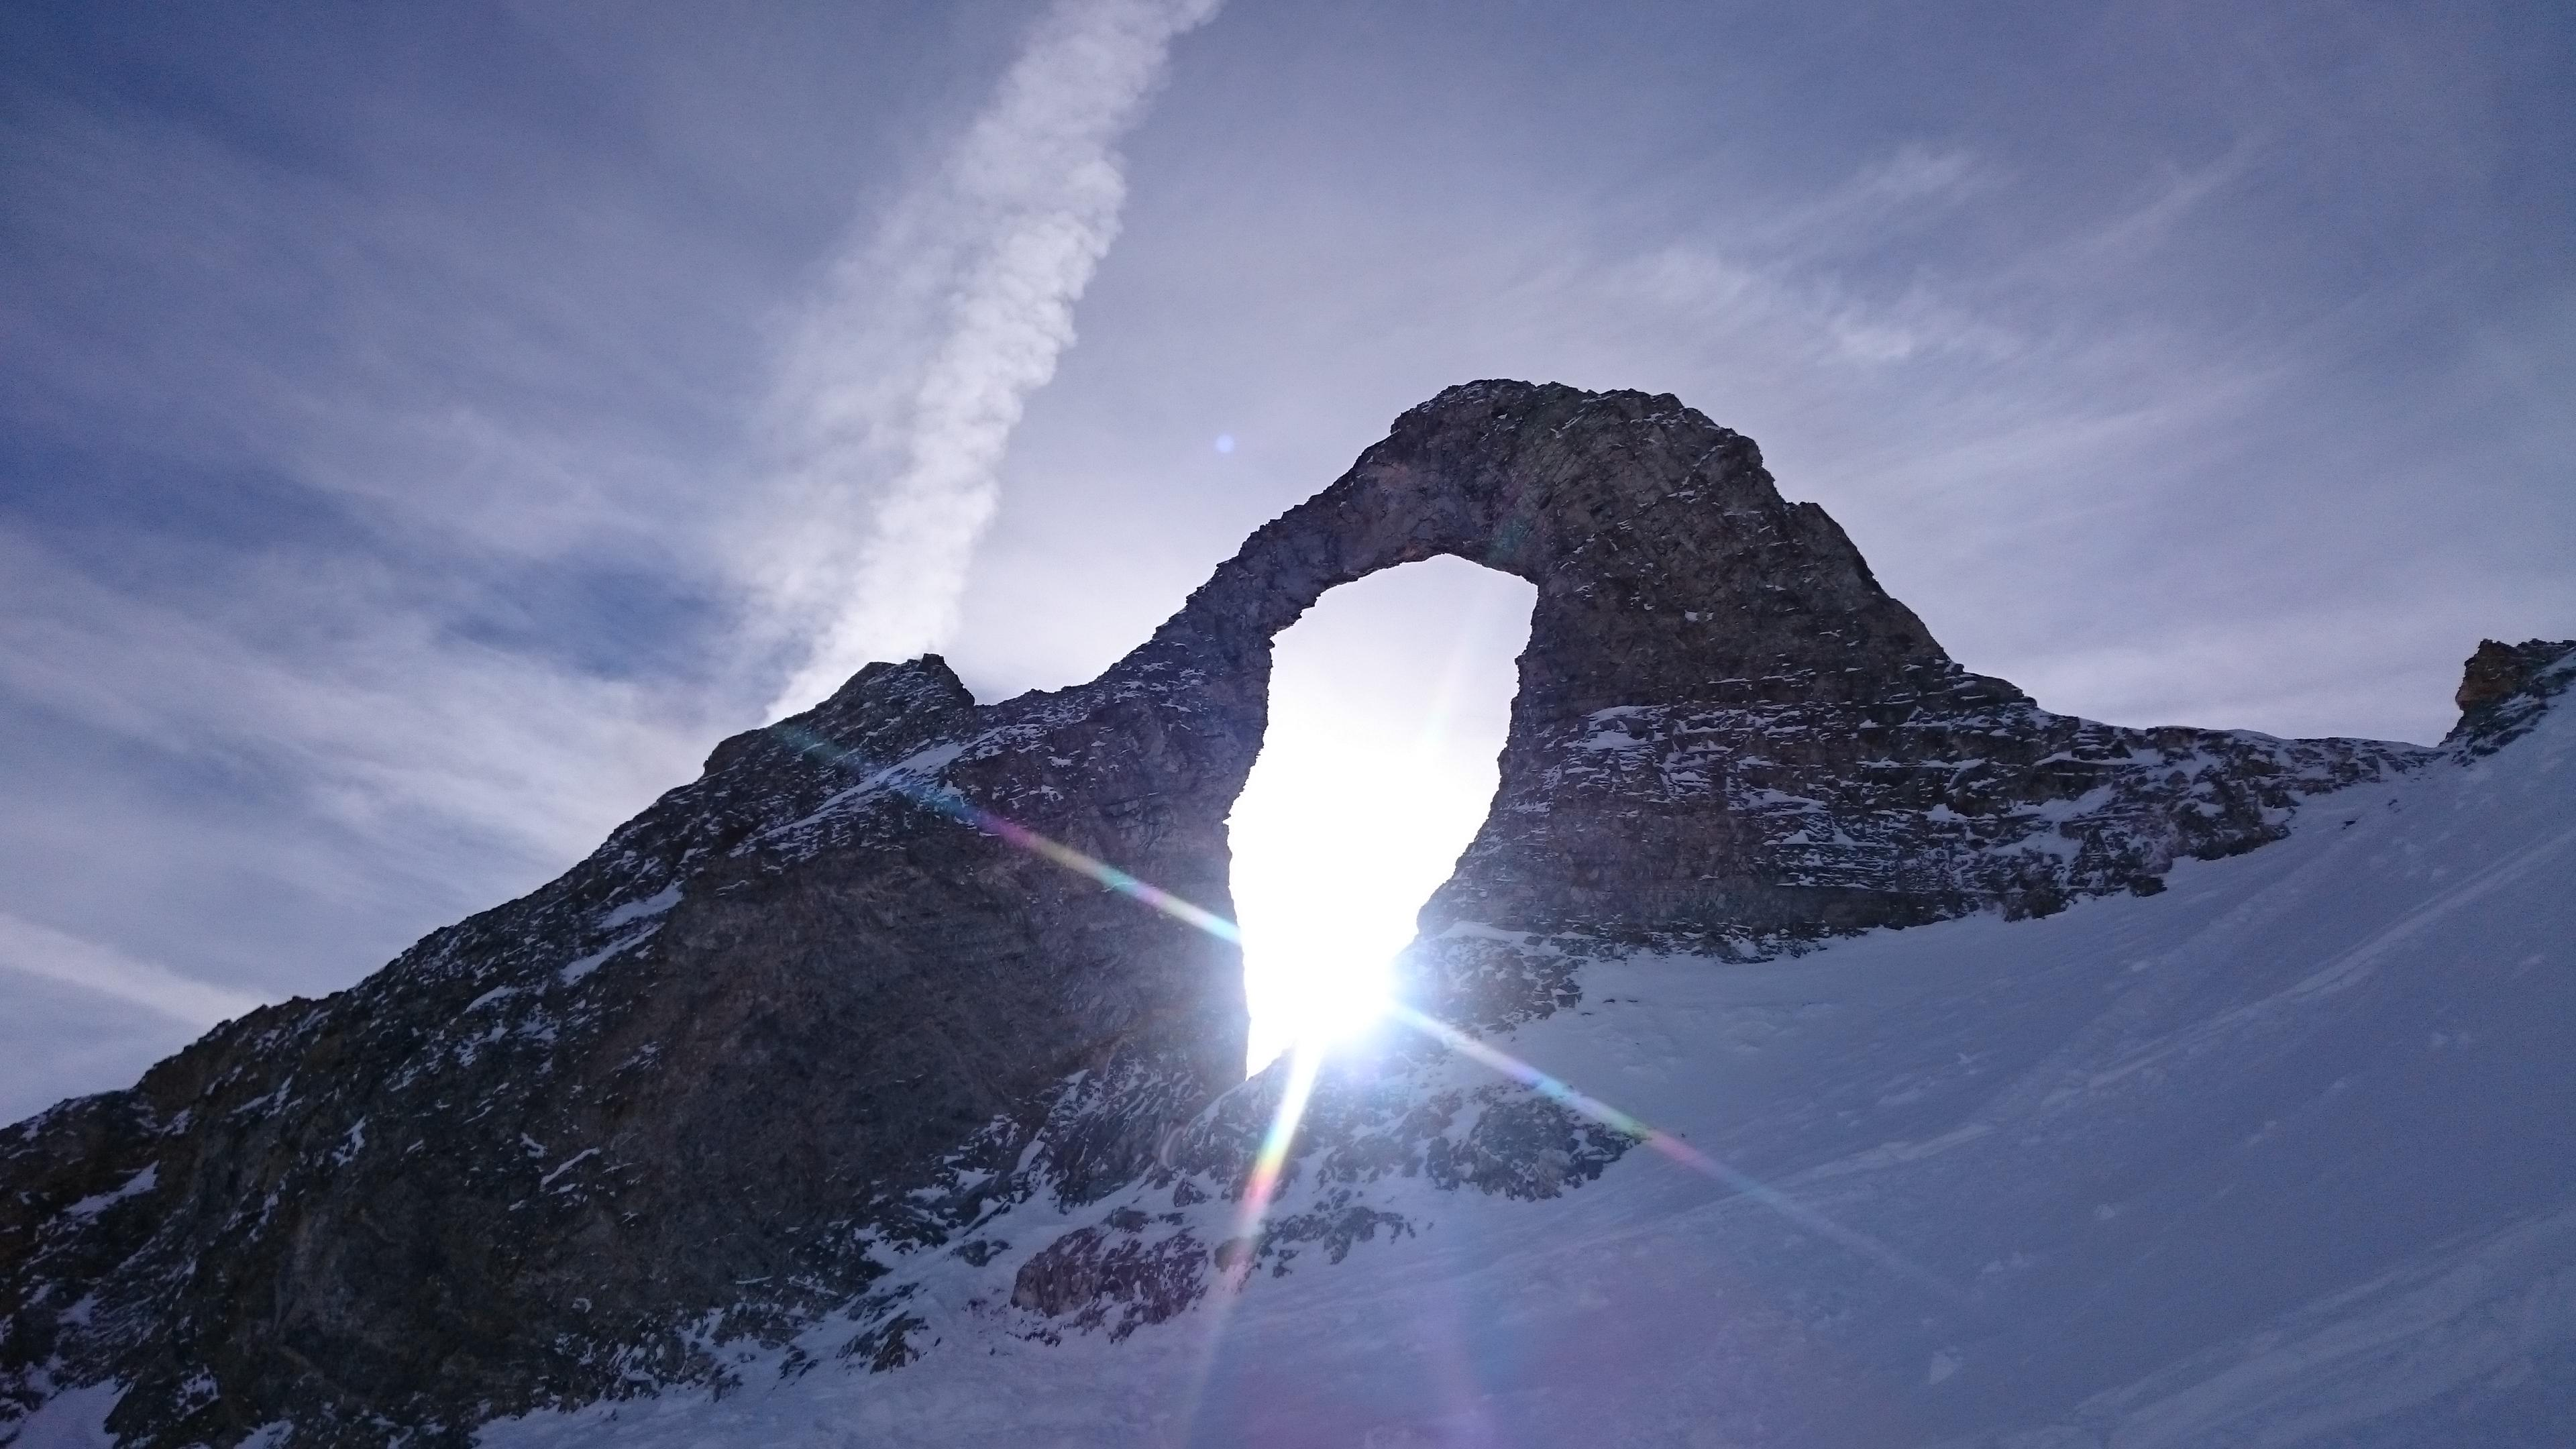 Sunshine trough the eye of the needleLAiguille Perce Tignes 3840x2160